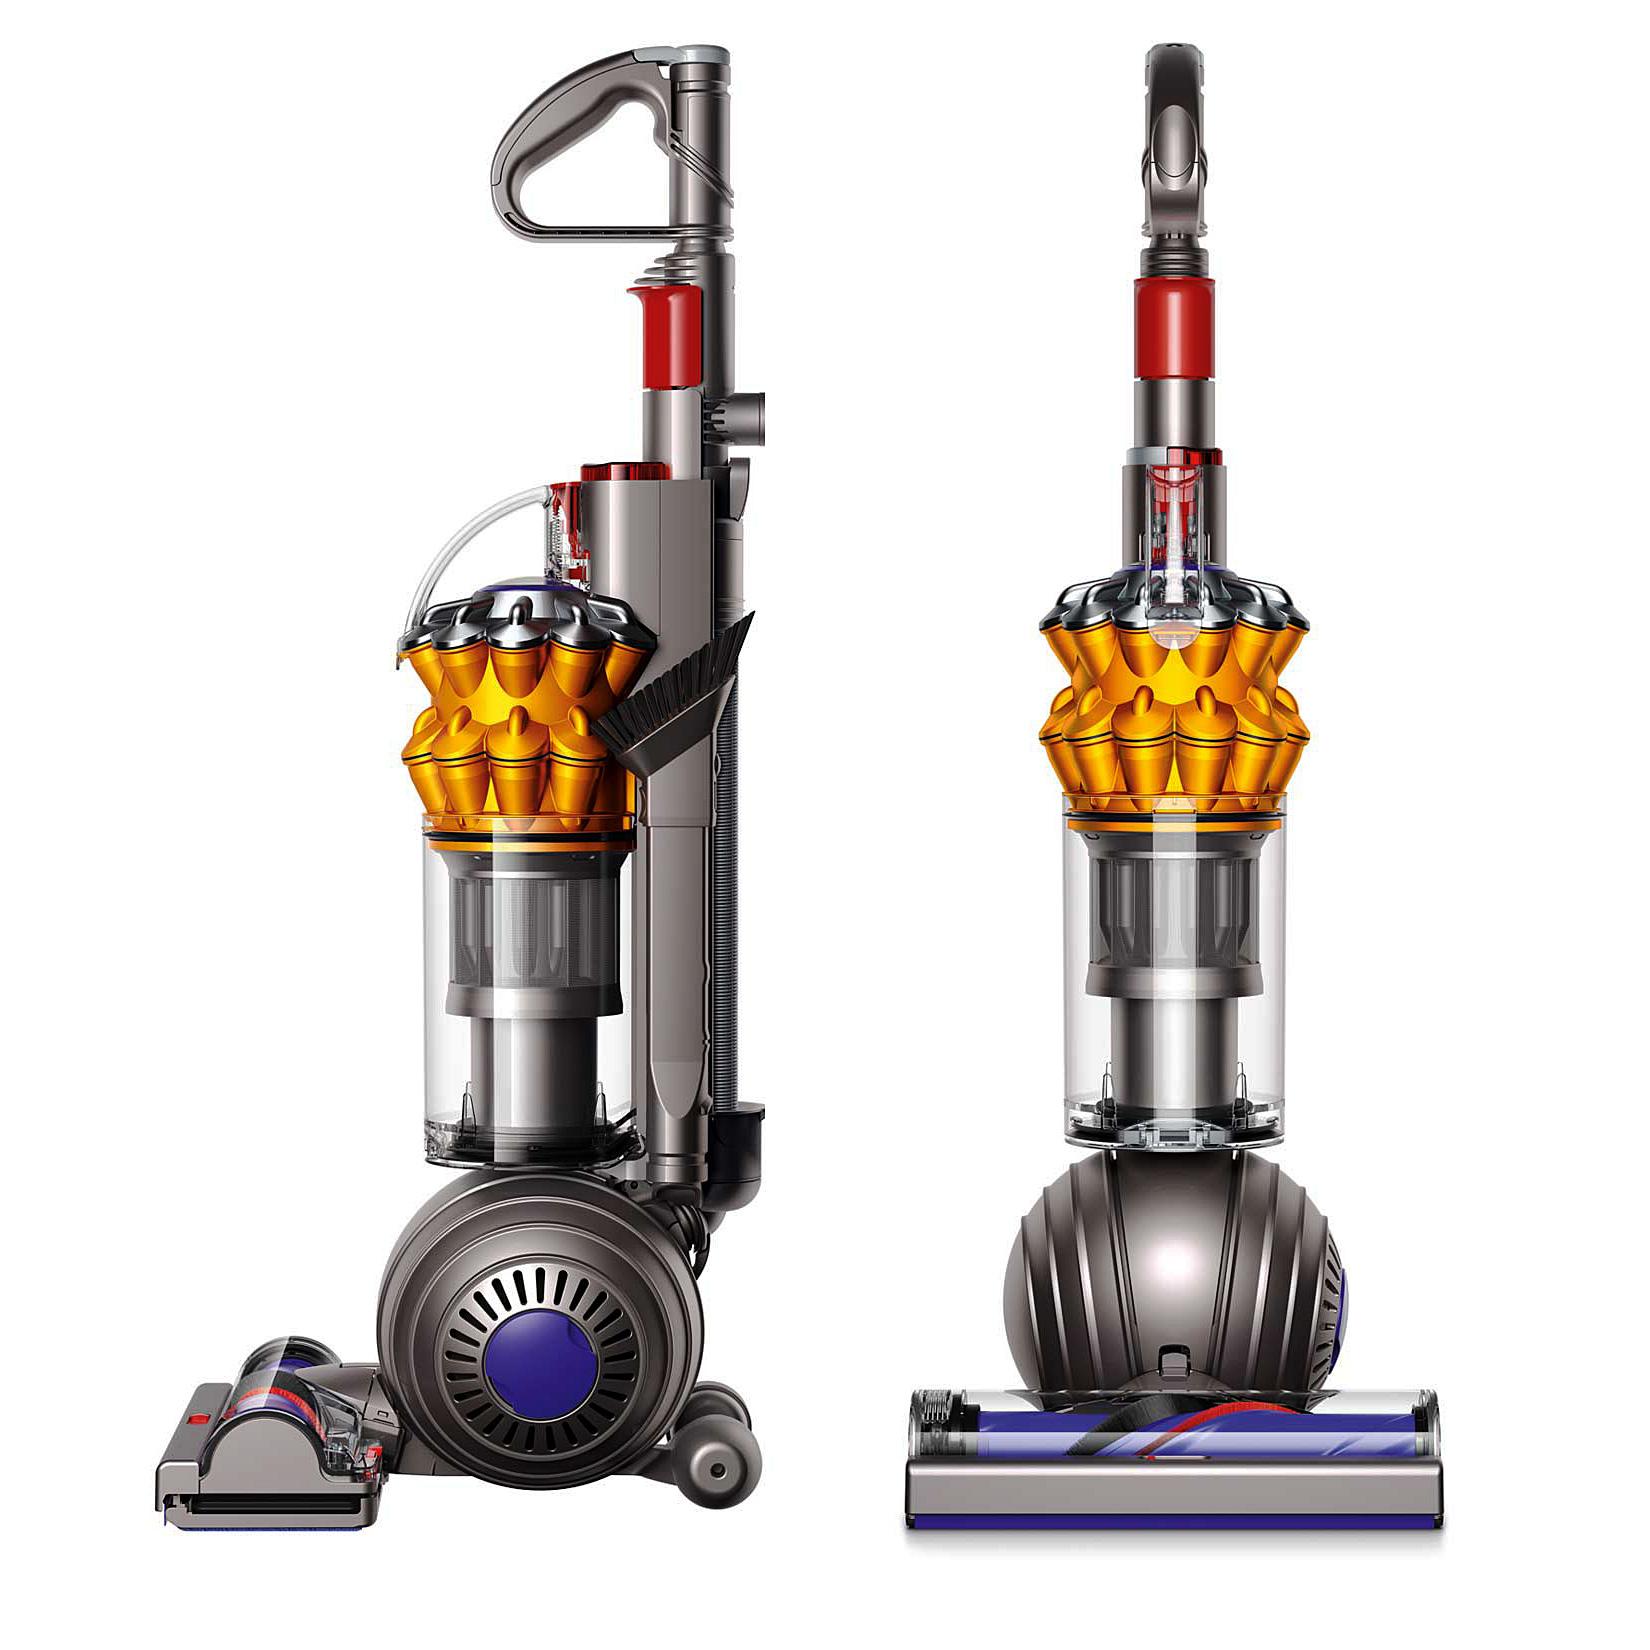 Dyson Small Ball Multifloor UP15MF Vacuum